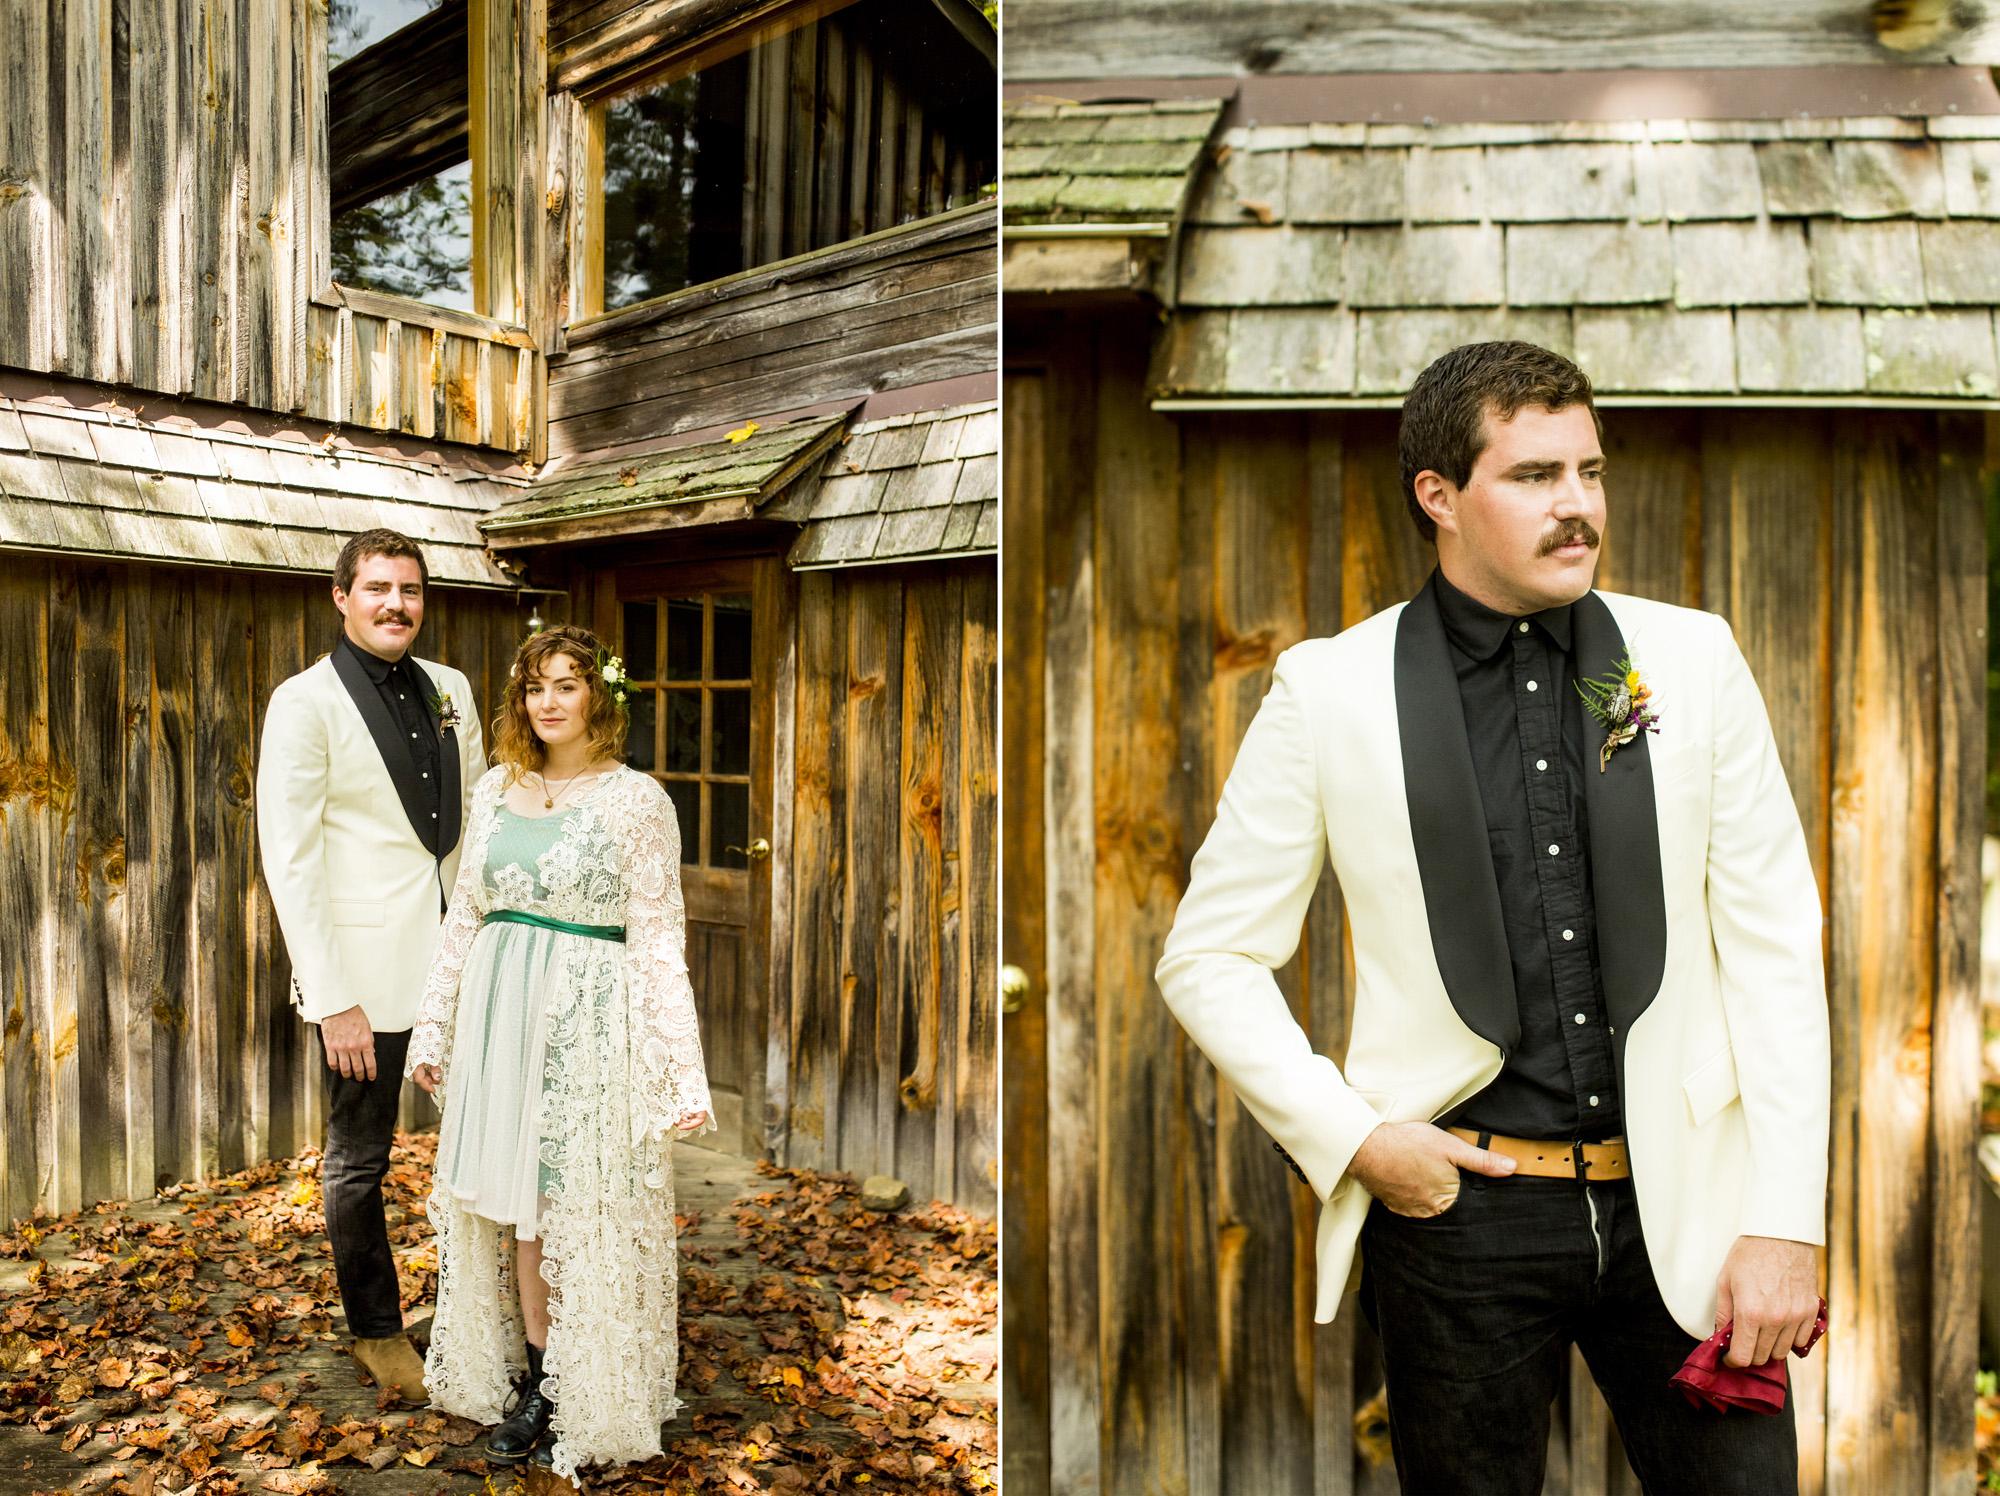 Seriously_Sabrina_Photography_Red_River_Gorge_Kentucky_Wedding_ShawnDana68.jpg